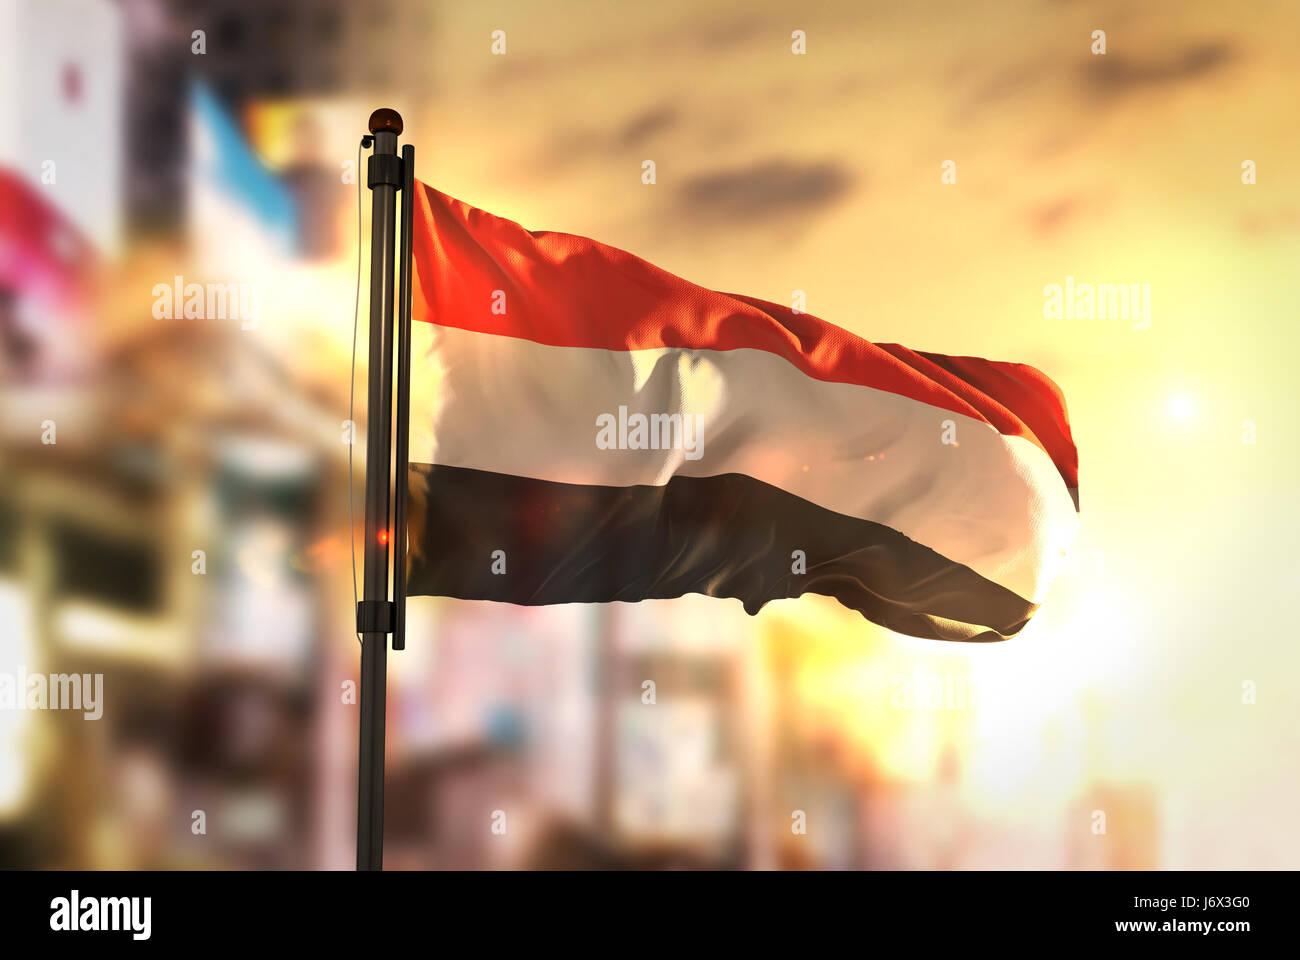 Yemen Flag Against City Blurred Background At Sunrise Backlight Stock Photo